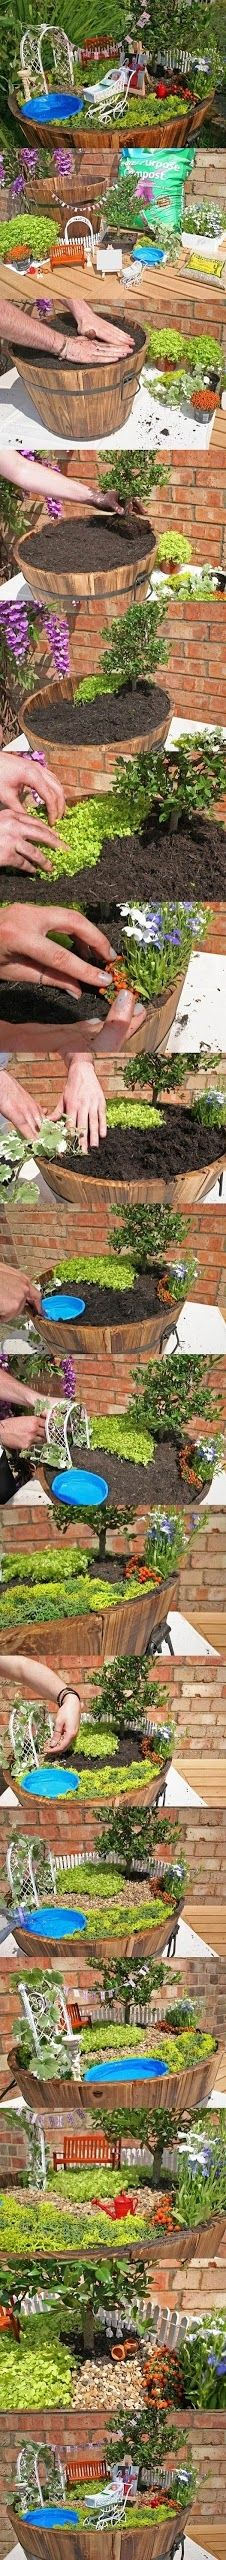 DIY Garden Fantasy garden. Many  DIY gardening ideas.   #KathyClulow 905.852.6143 www.KathyClulow.ca